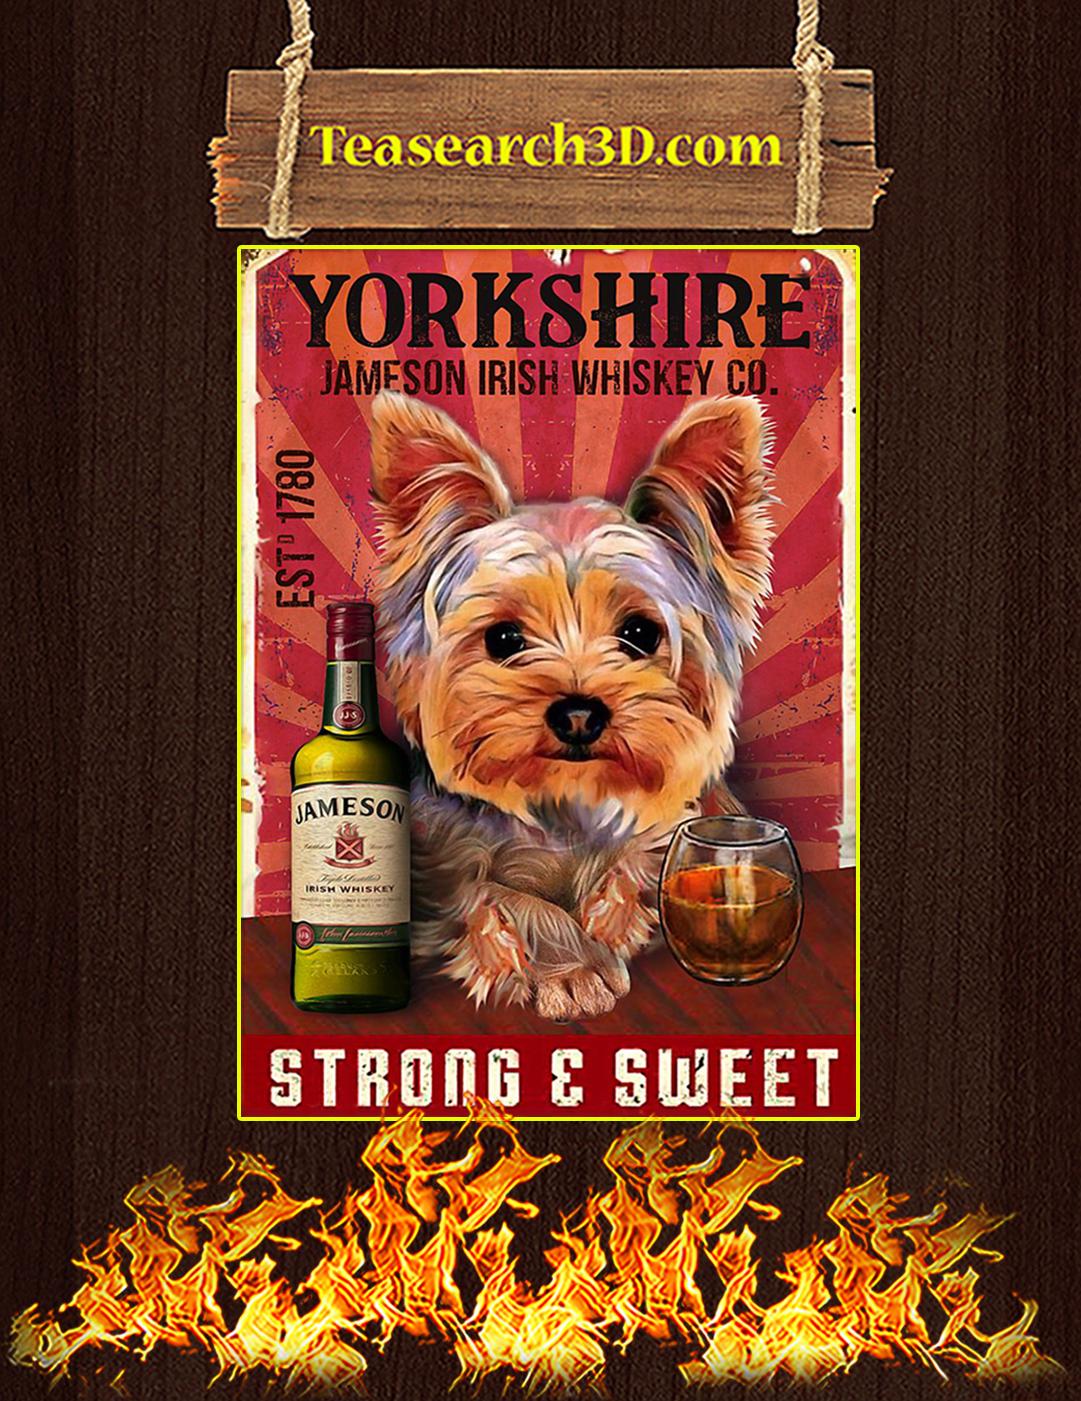 Yorkshire jameson irish whiskey co poster A2